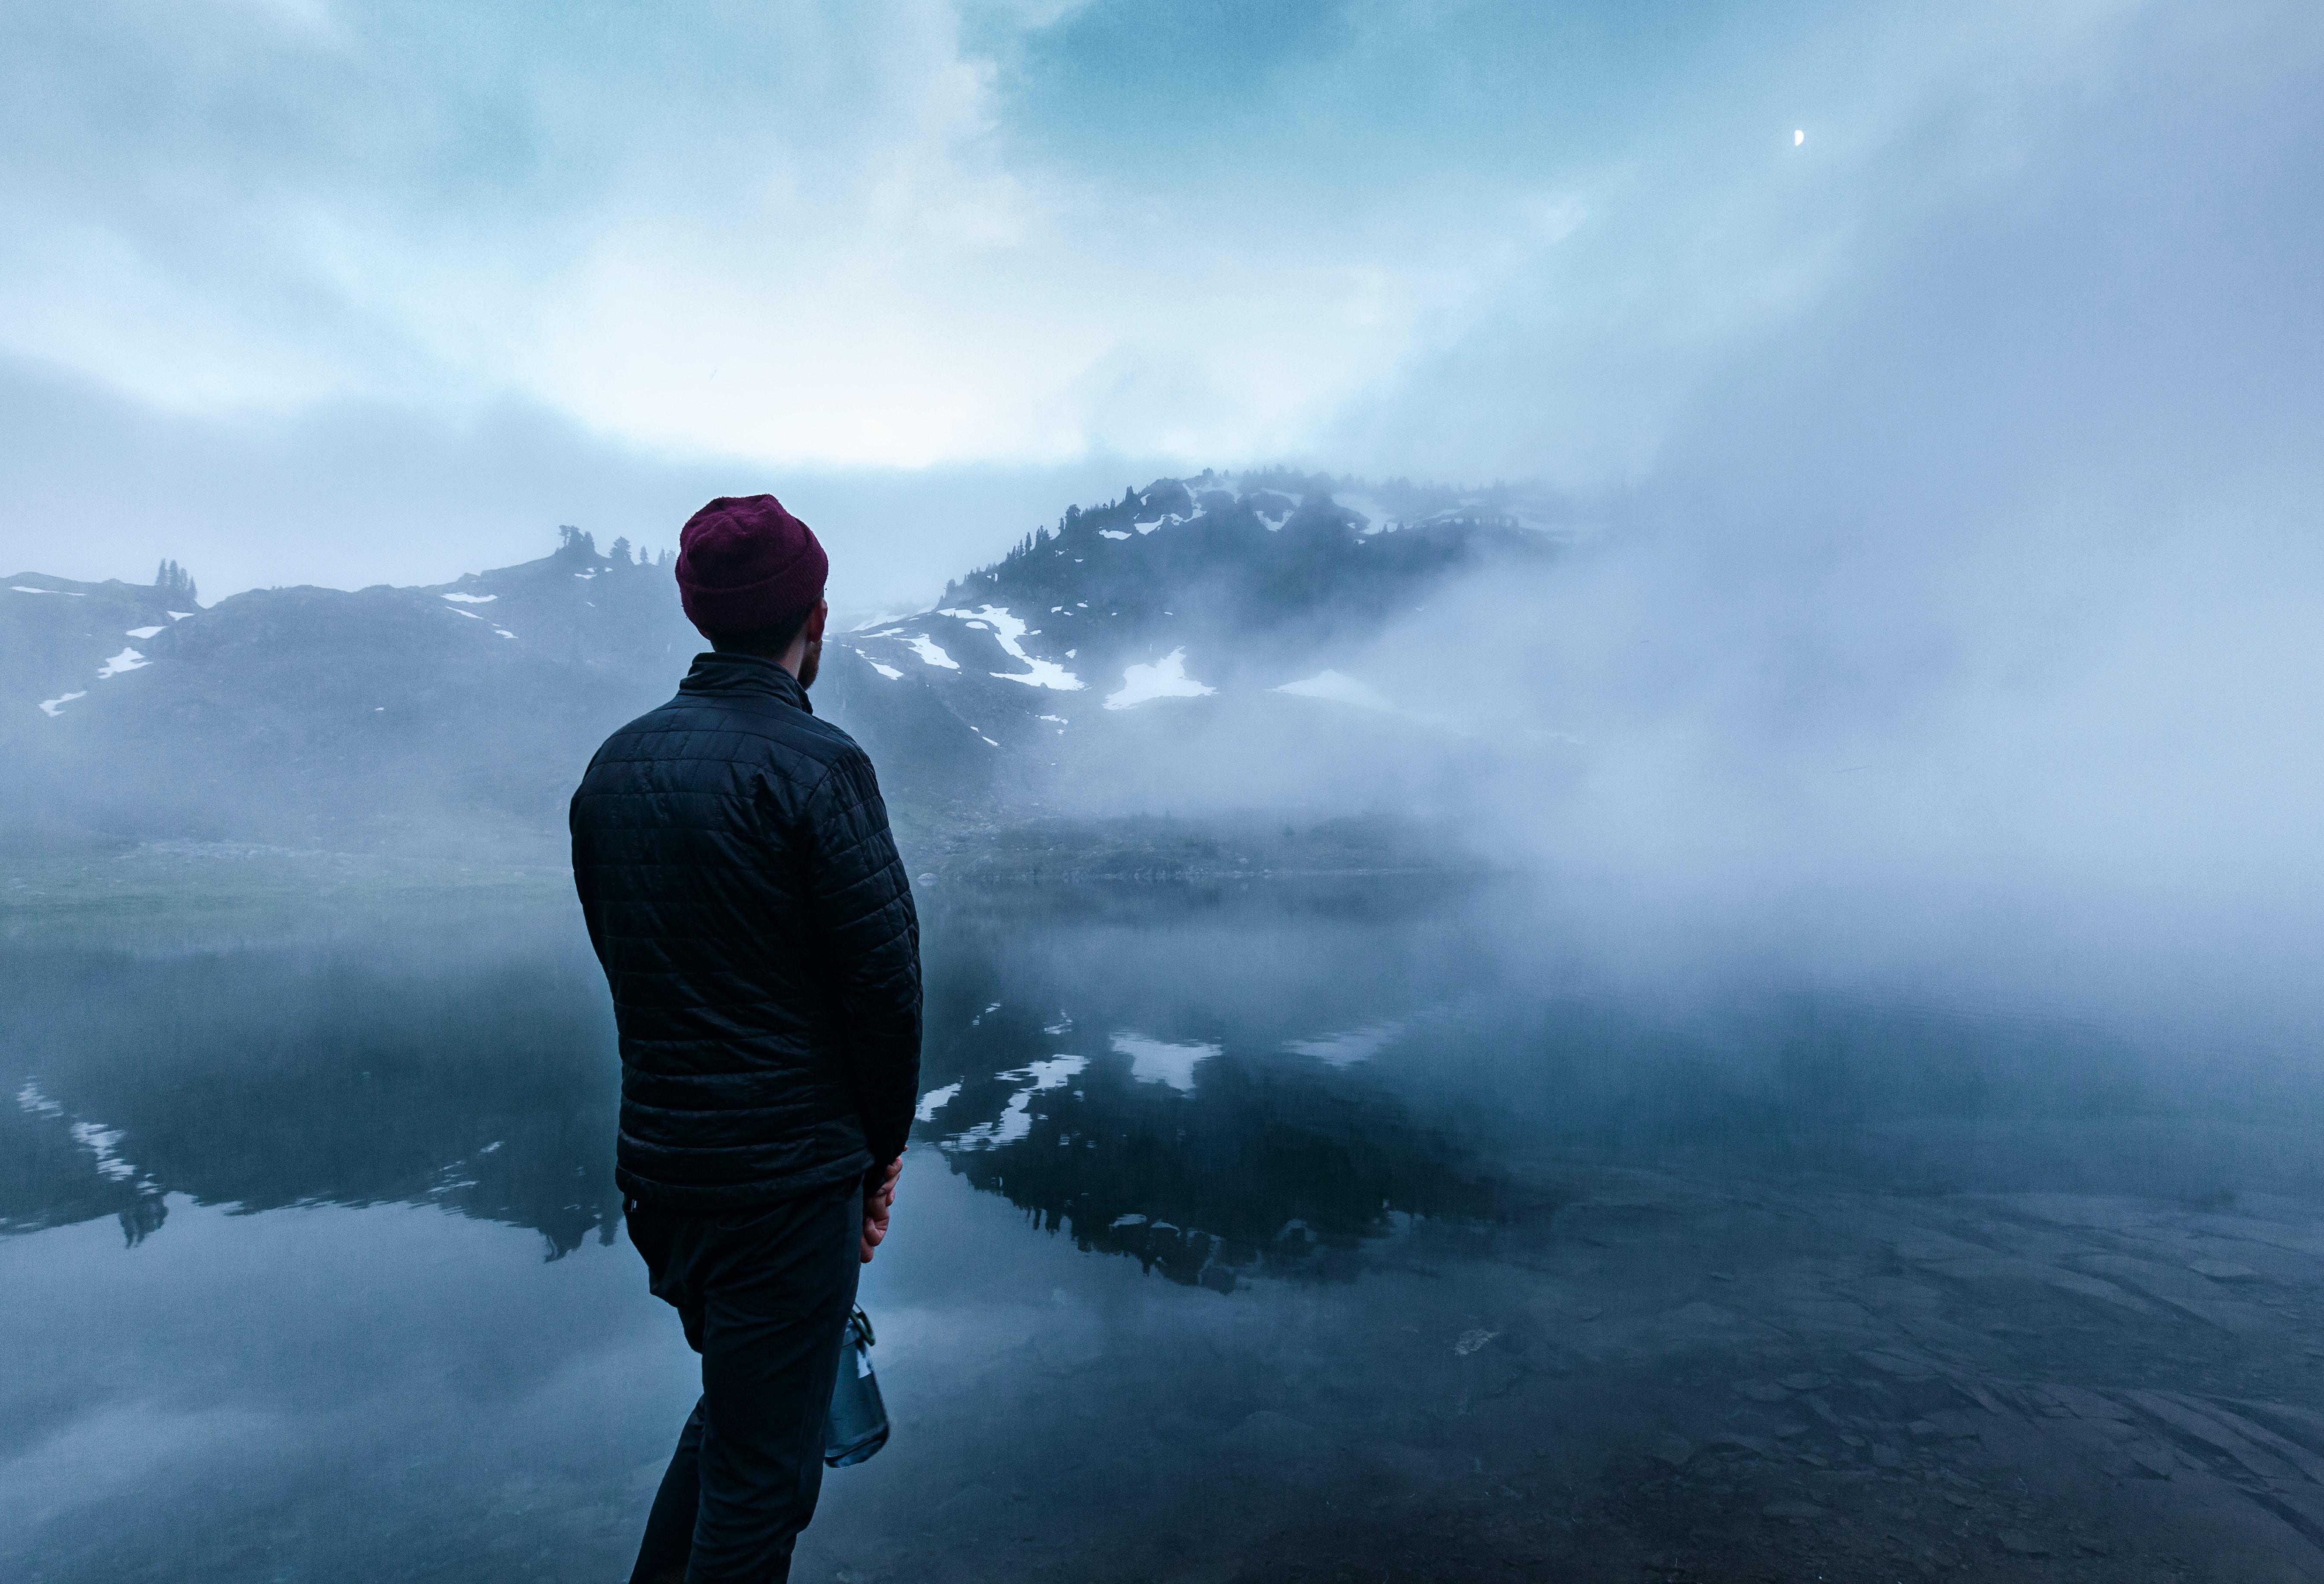 man standing near body of water